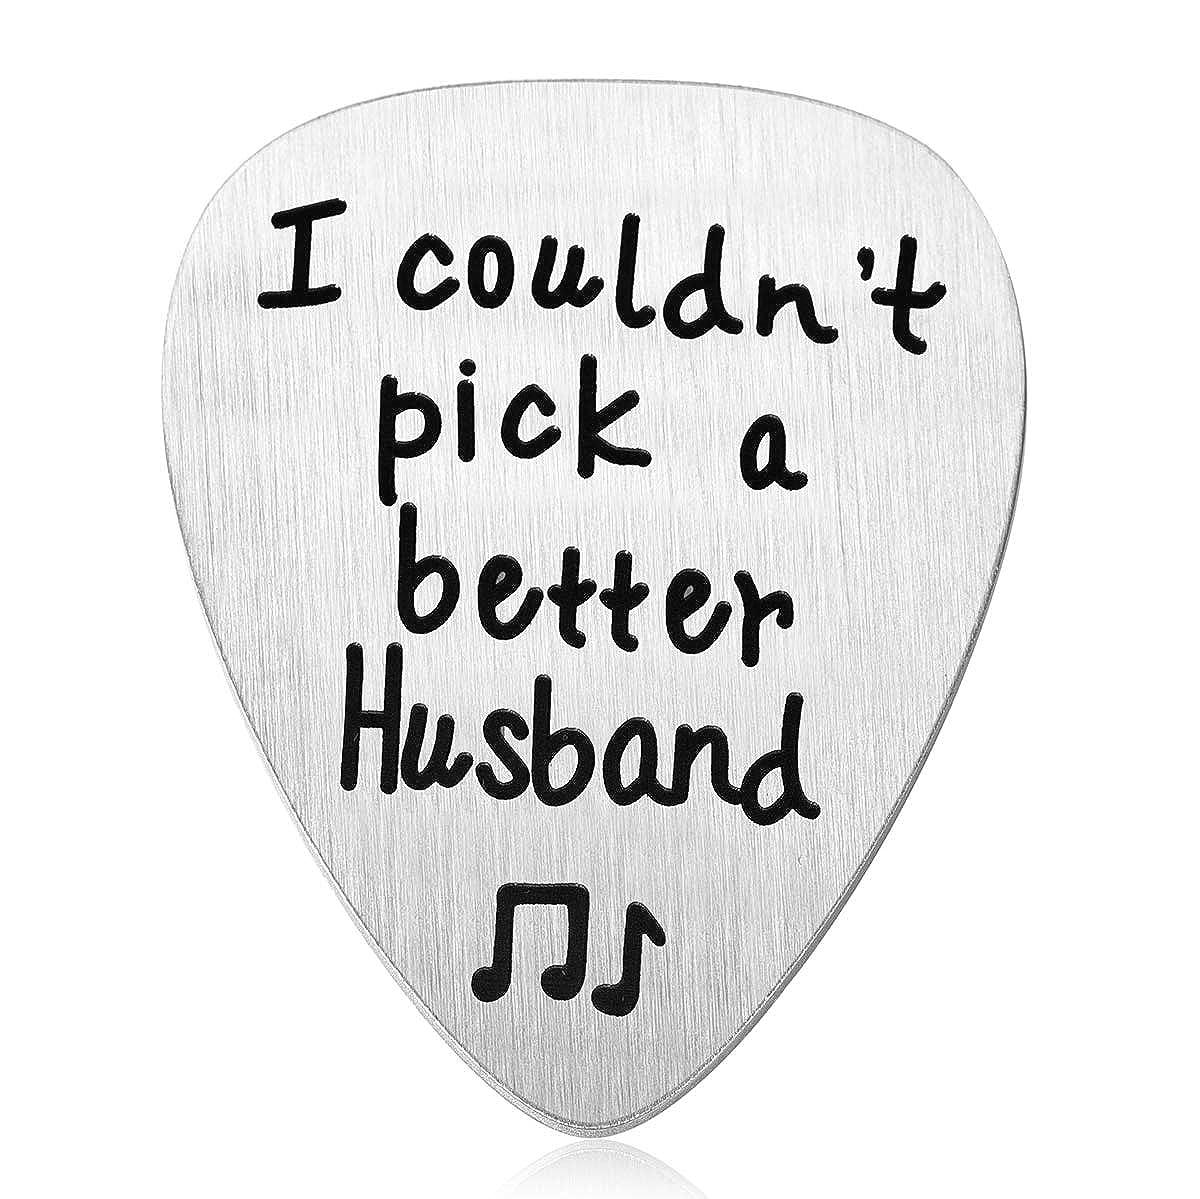 JZSTA ギター ピック 夫へのギフト 妻からの最高の夫へのギフト 音楽家夫へのユニークな誕生日   B07N779GDJ